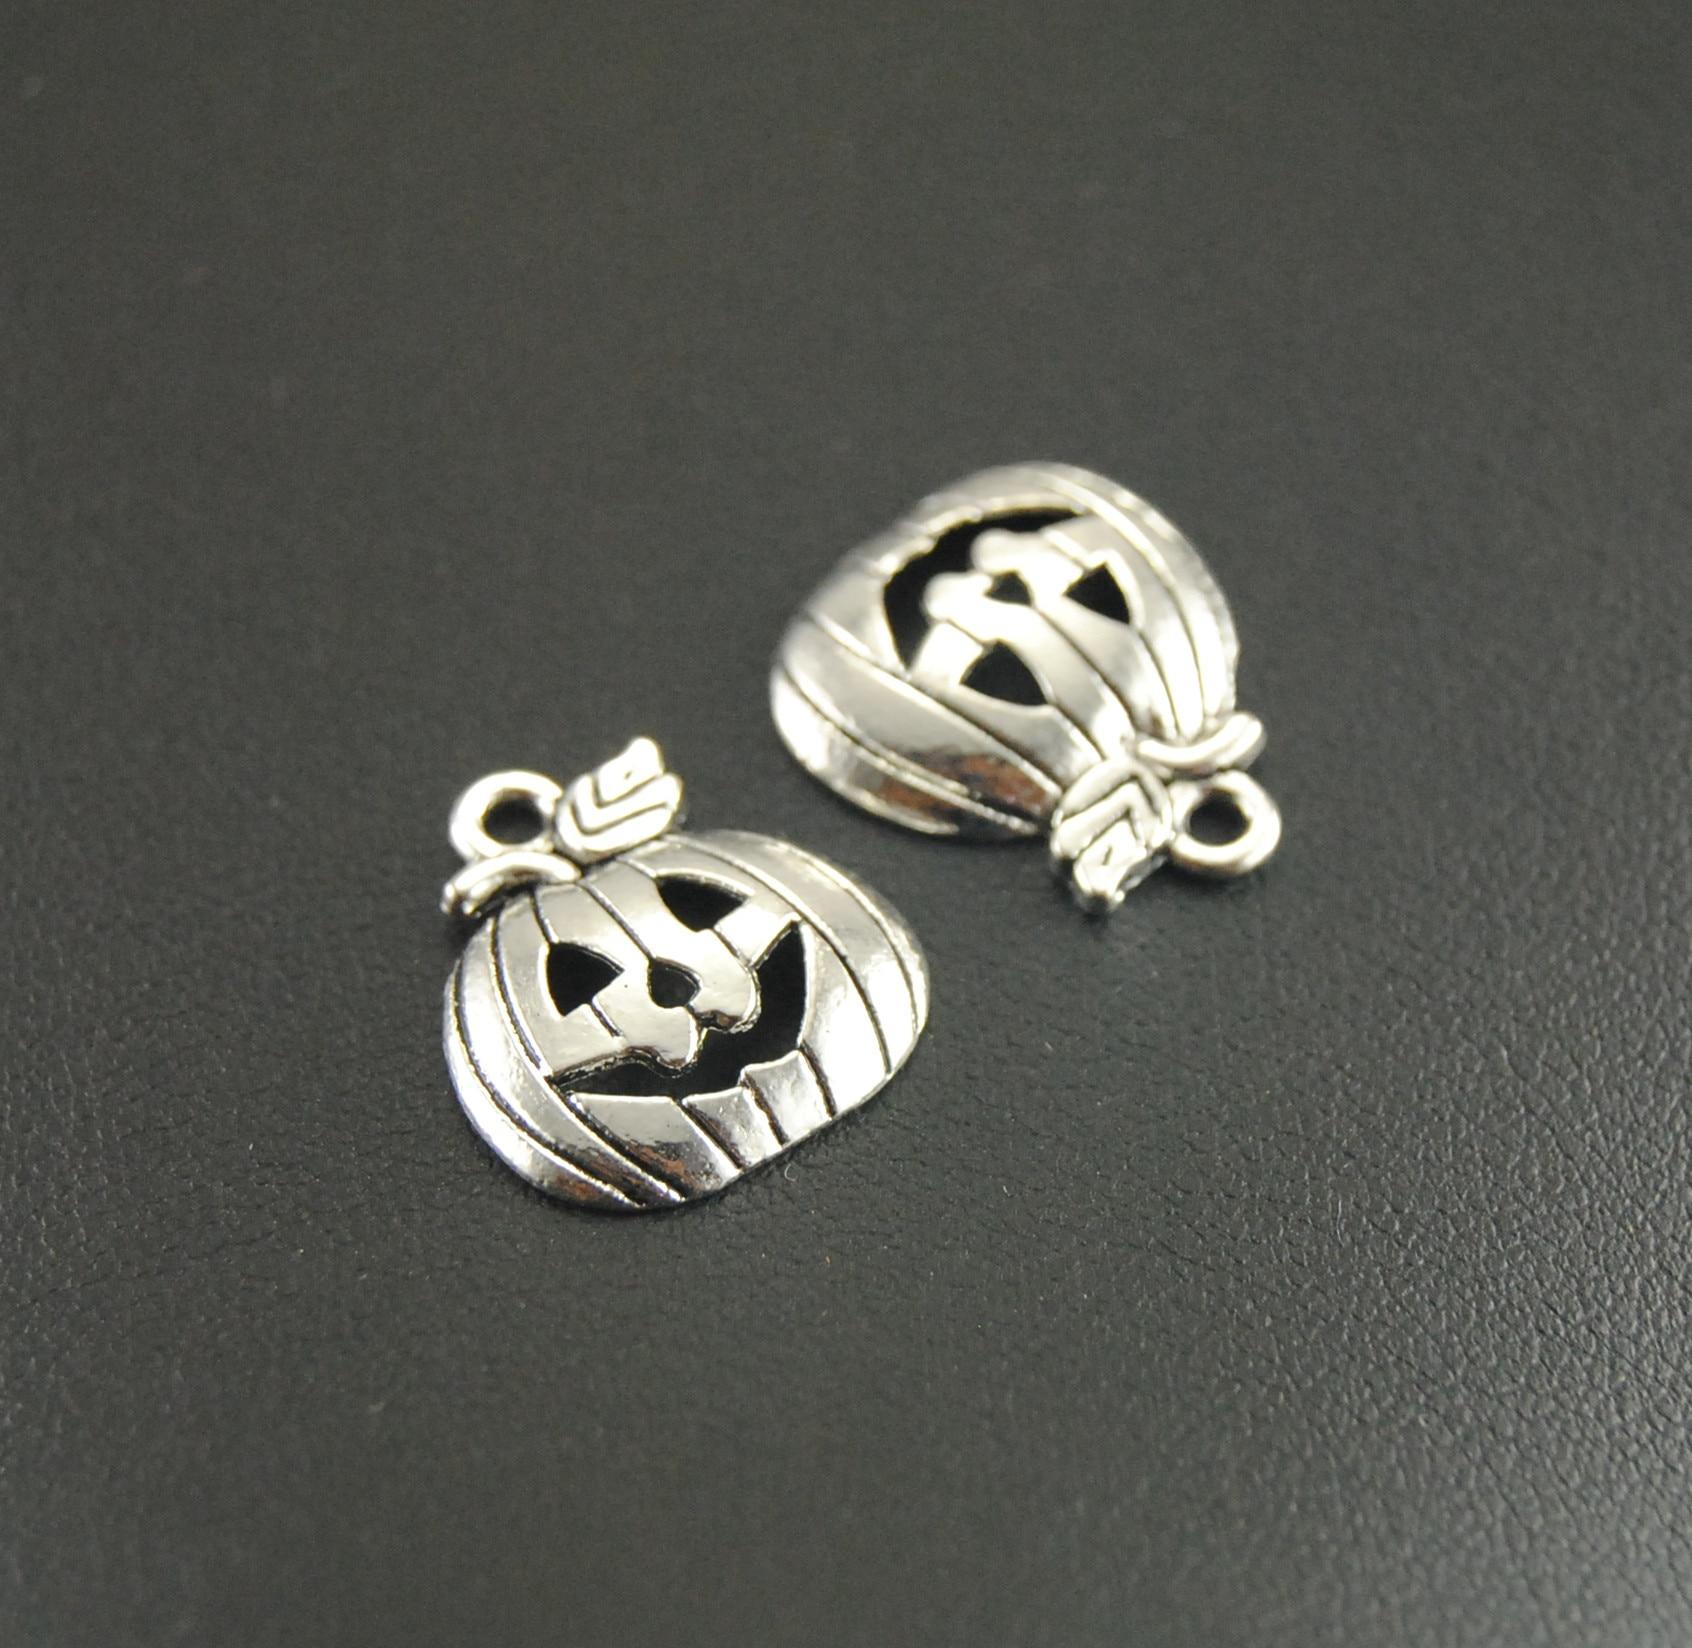 10 Pcs Metal Alloy Halloween Antique Silver Pumpkin Charms Pendants Smile Pumpkin Charm Accessories 19x16mm A277